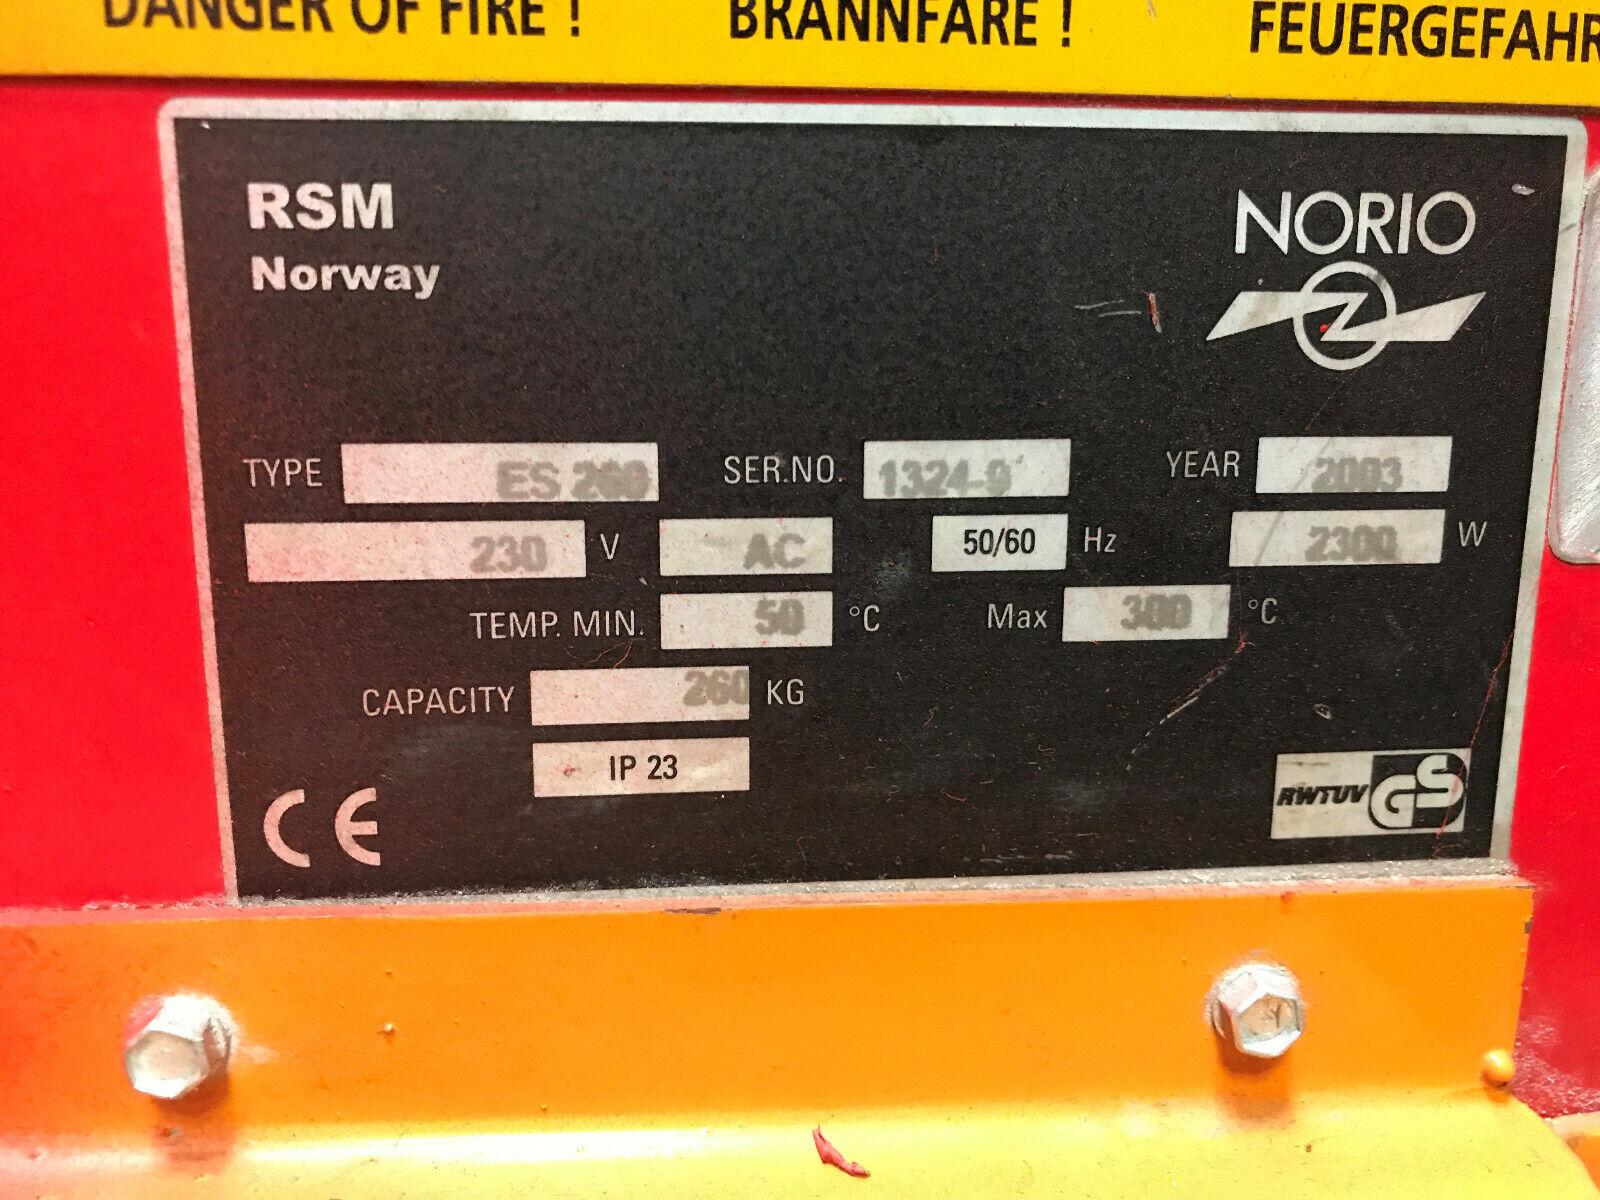 Norio Elektrodentrockner ES 200 Elektrodenofen, Trockenschrank